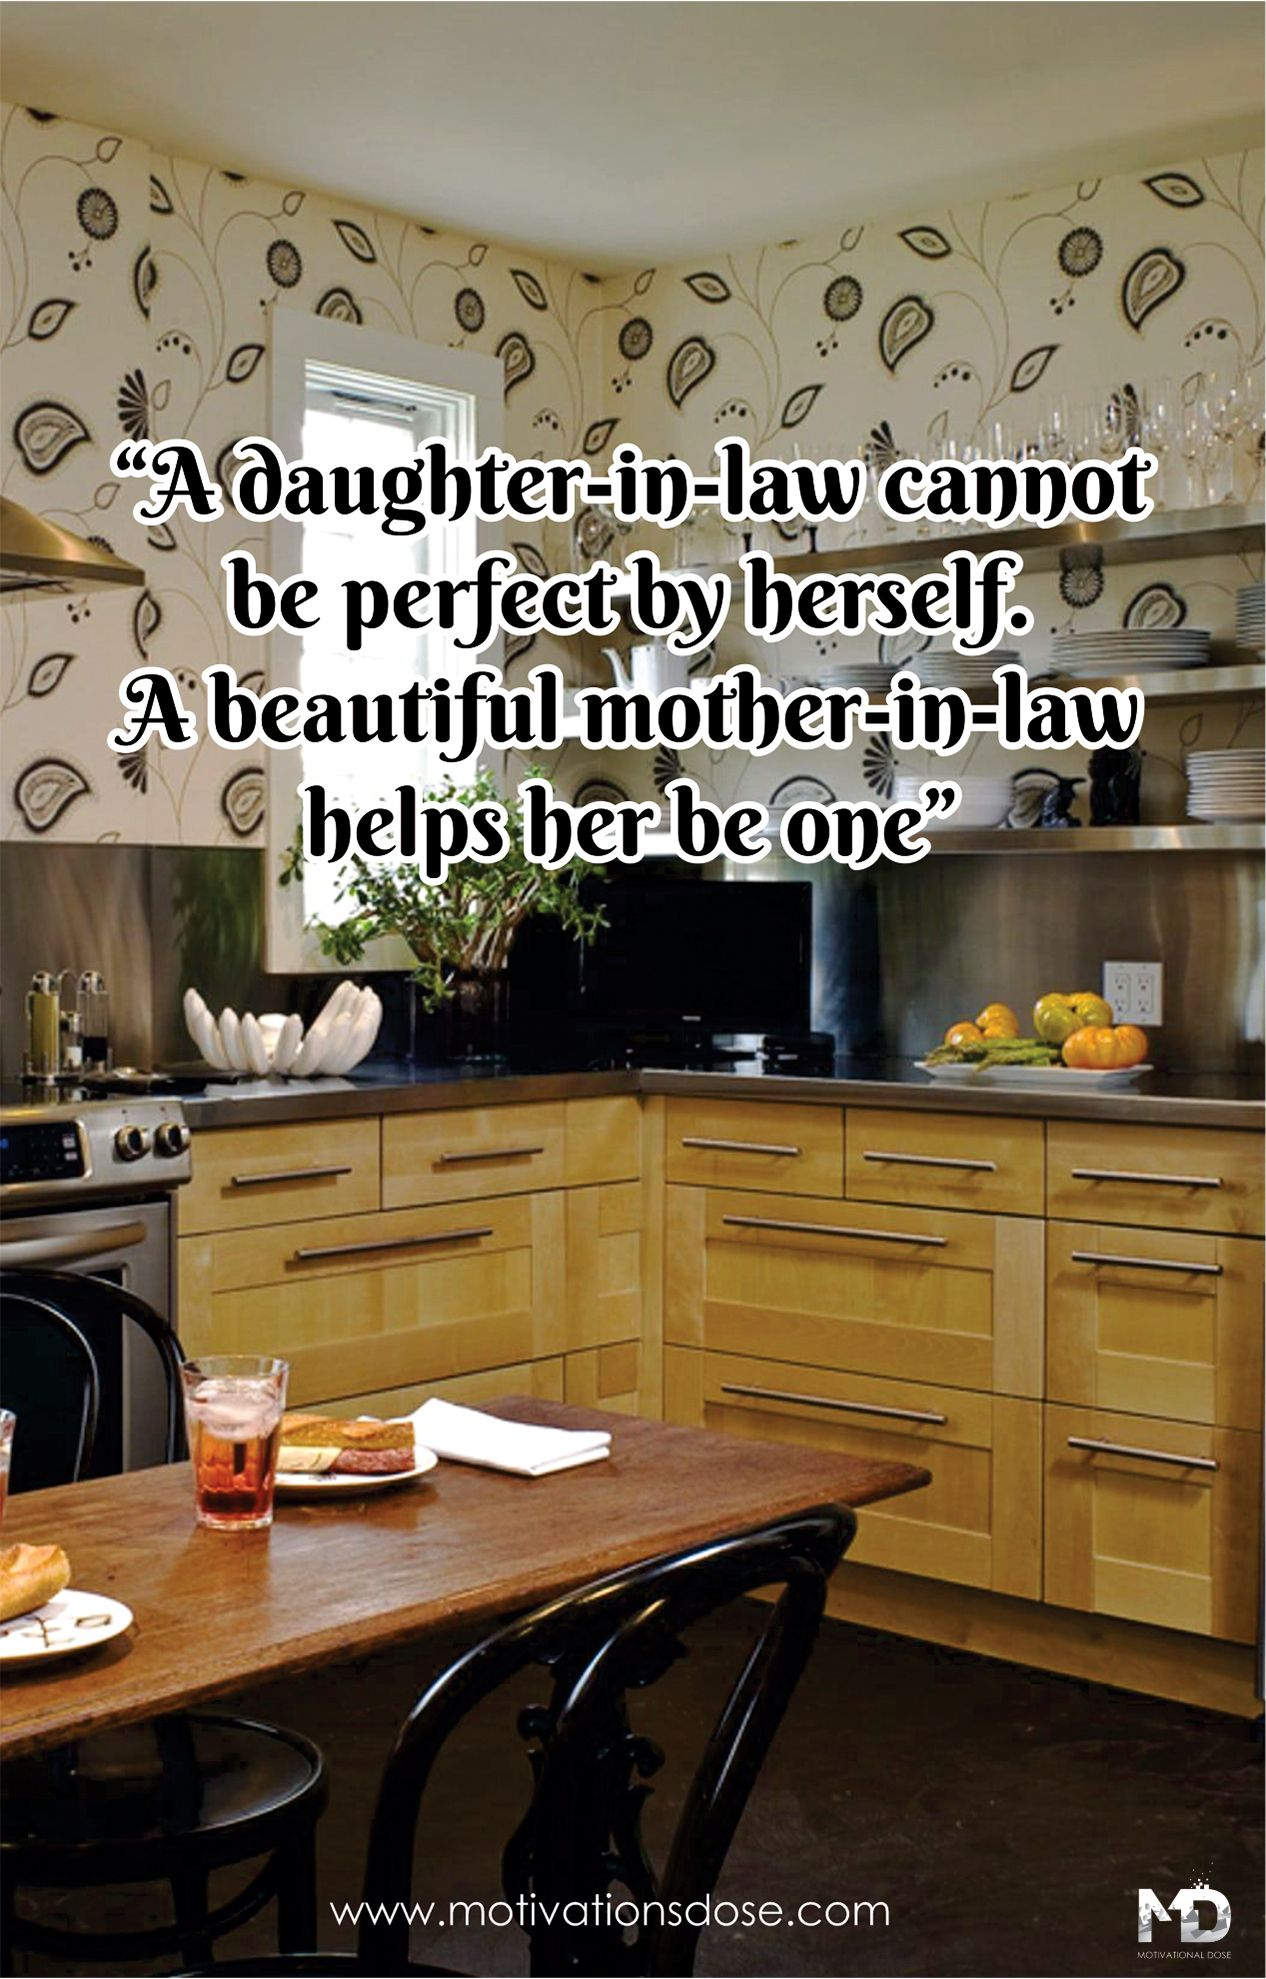 Top 10 Mother In Law Quotes Mother In Law Quotes Law Quotes Mother Quotes